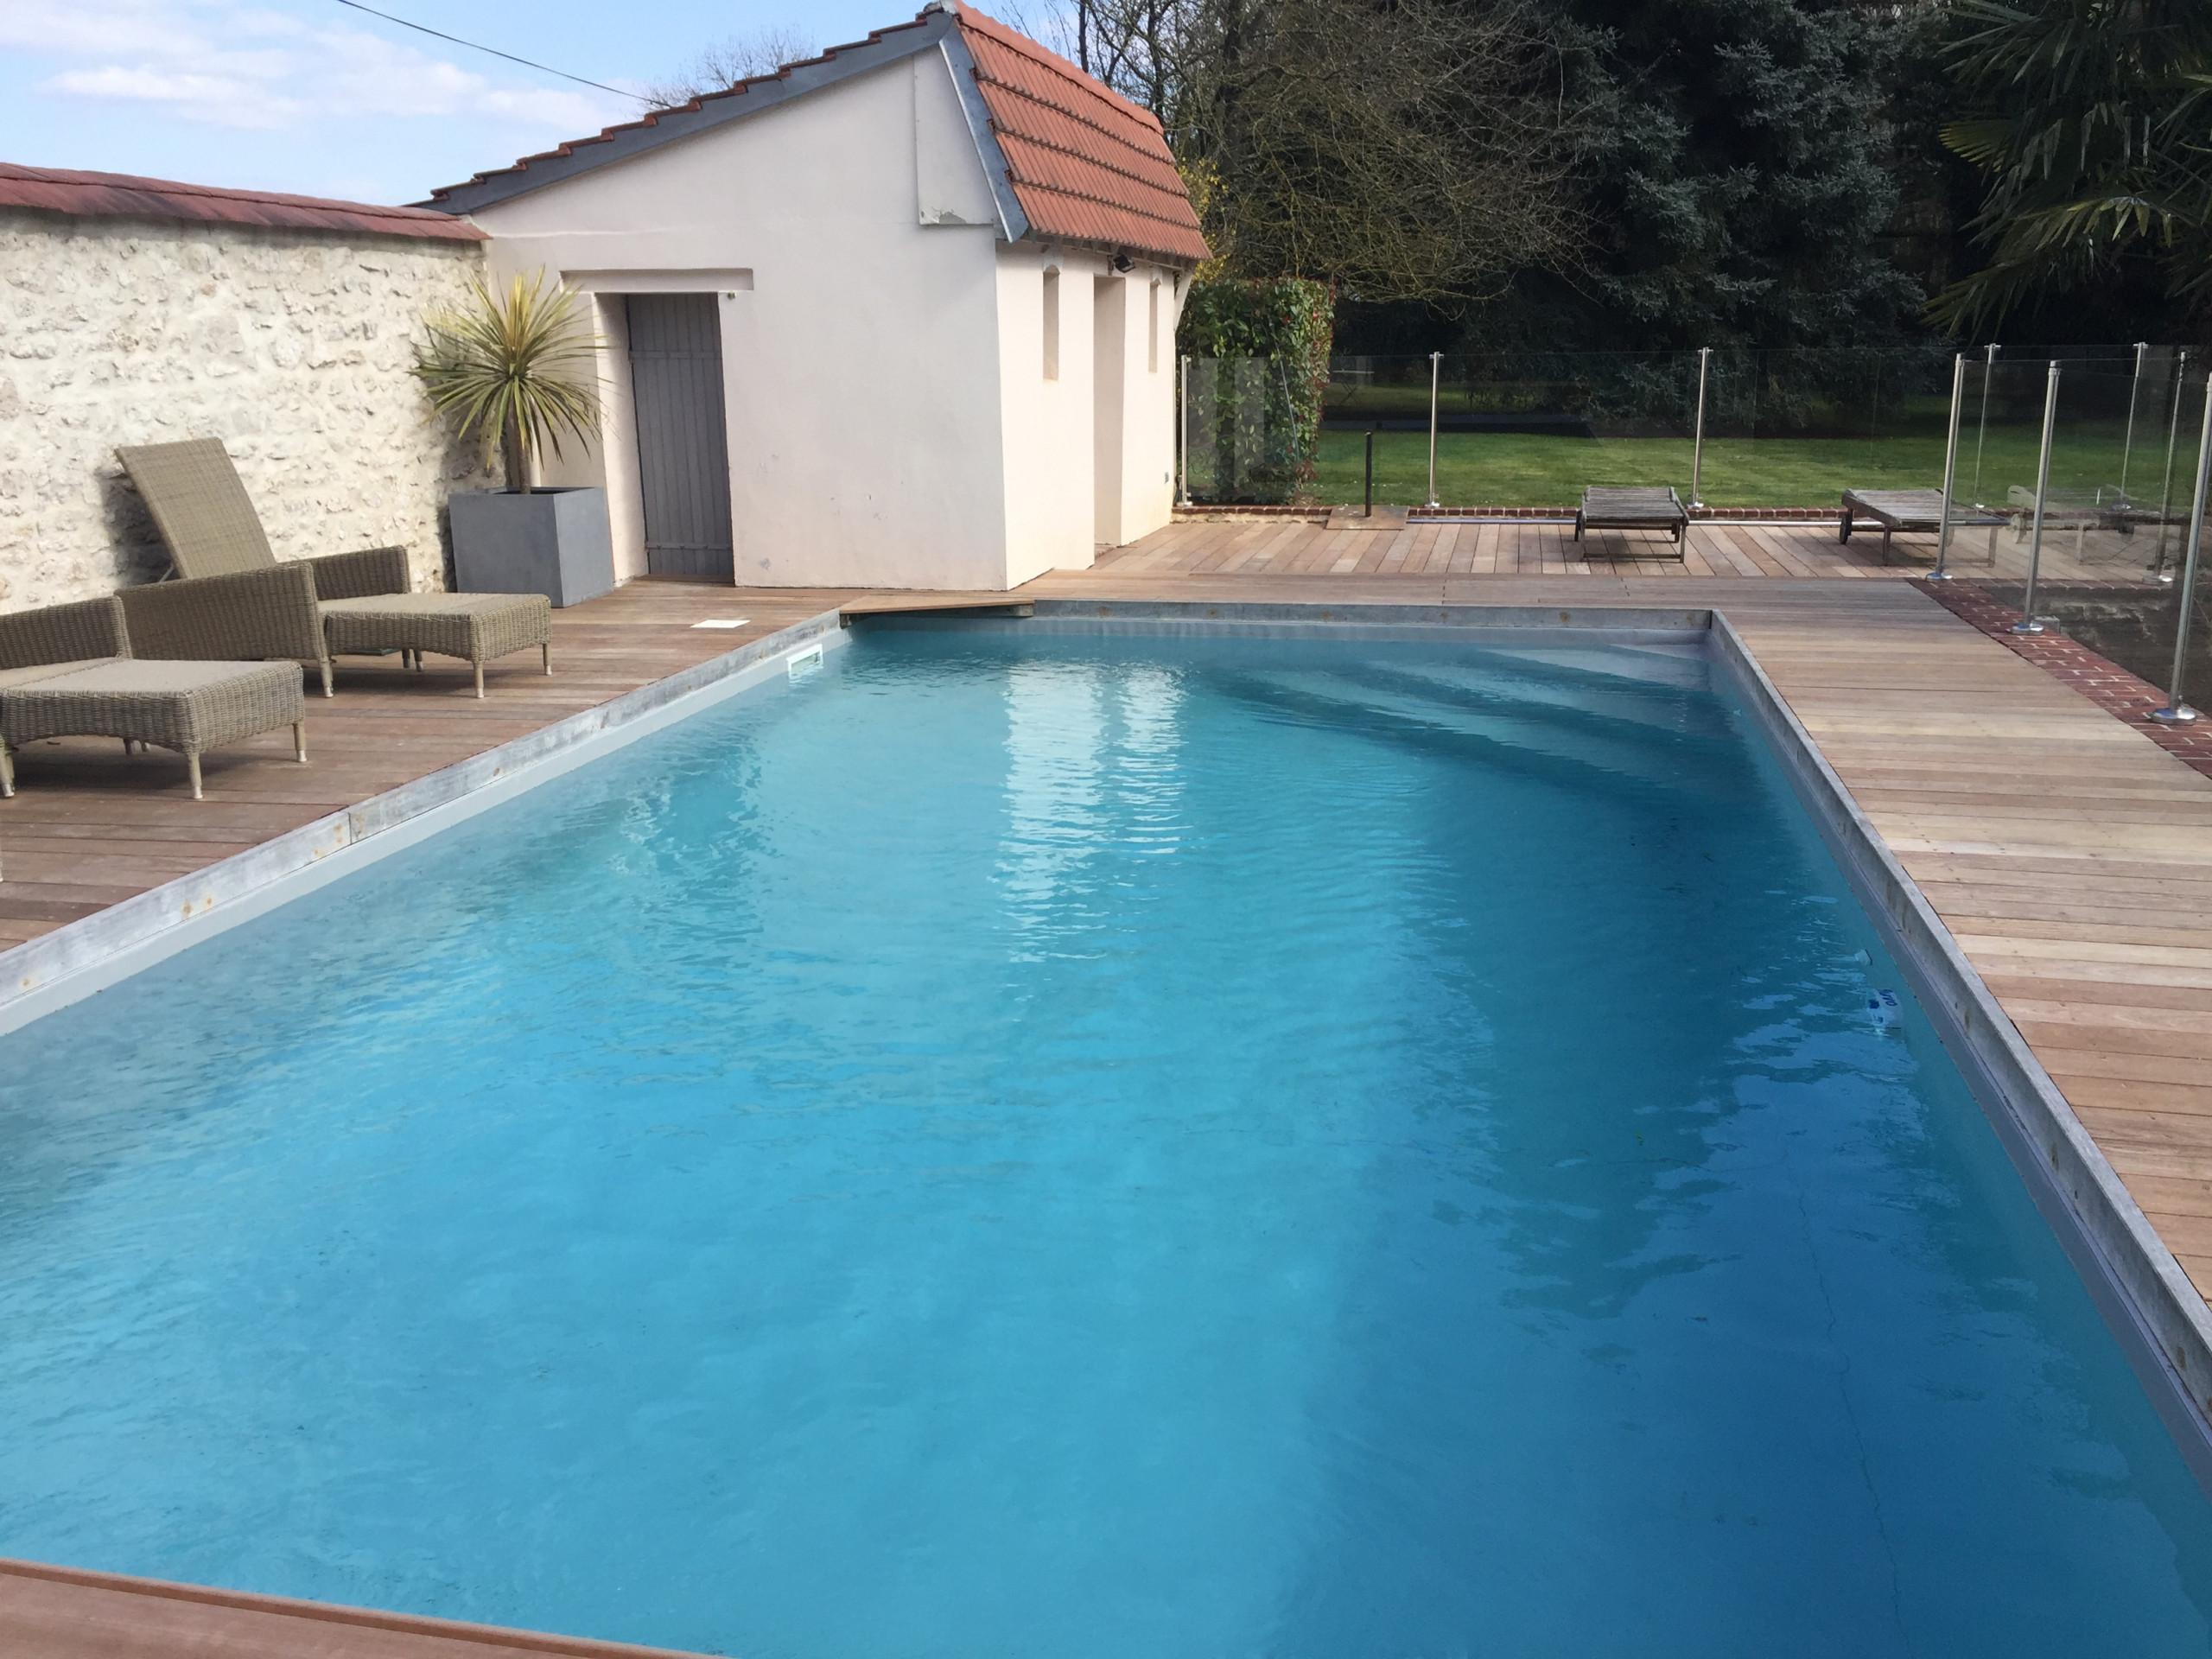 Avant/Après piscine en béton enterrée (Lésigny)